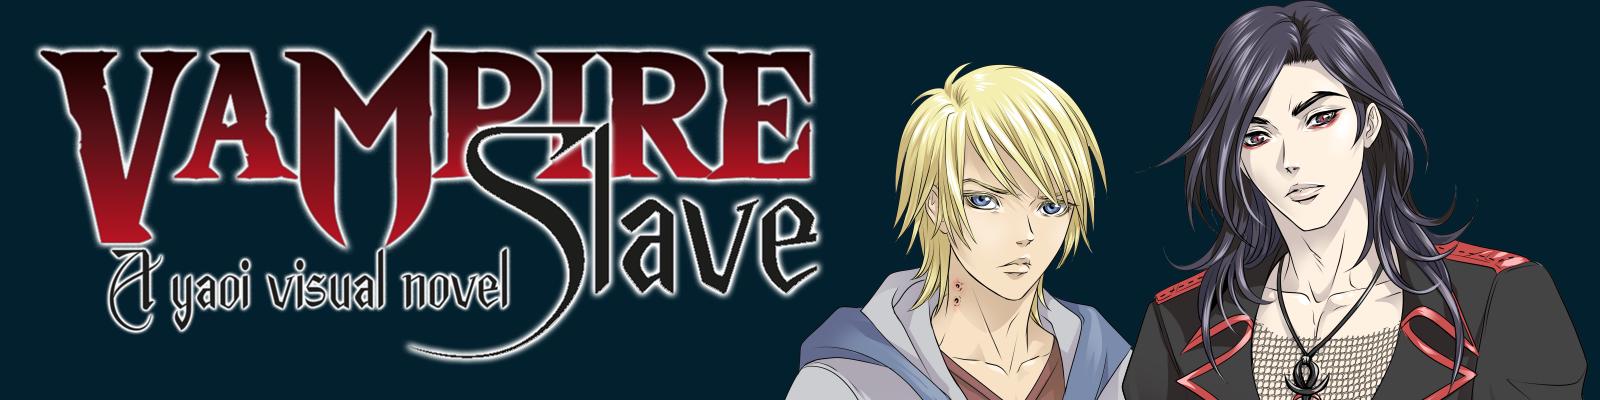 Vampire Slave: A Yaoi Visual Novel